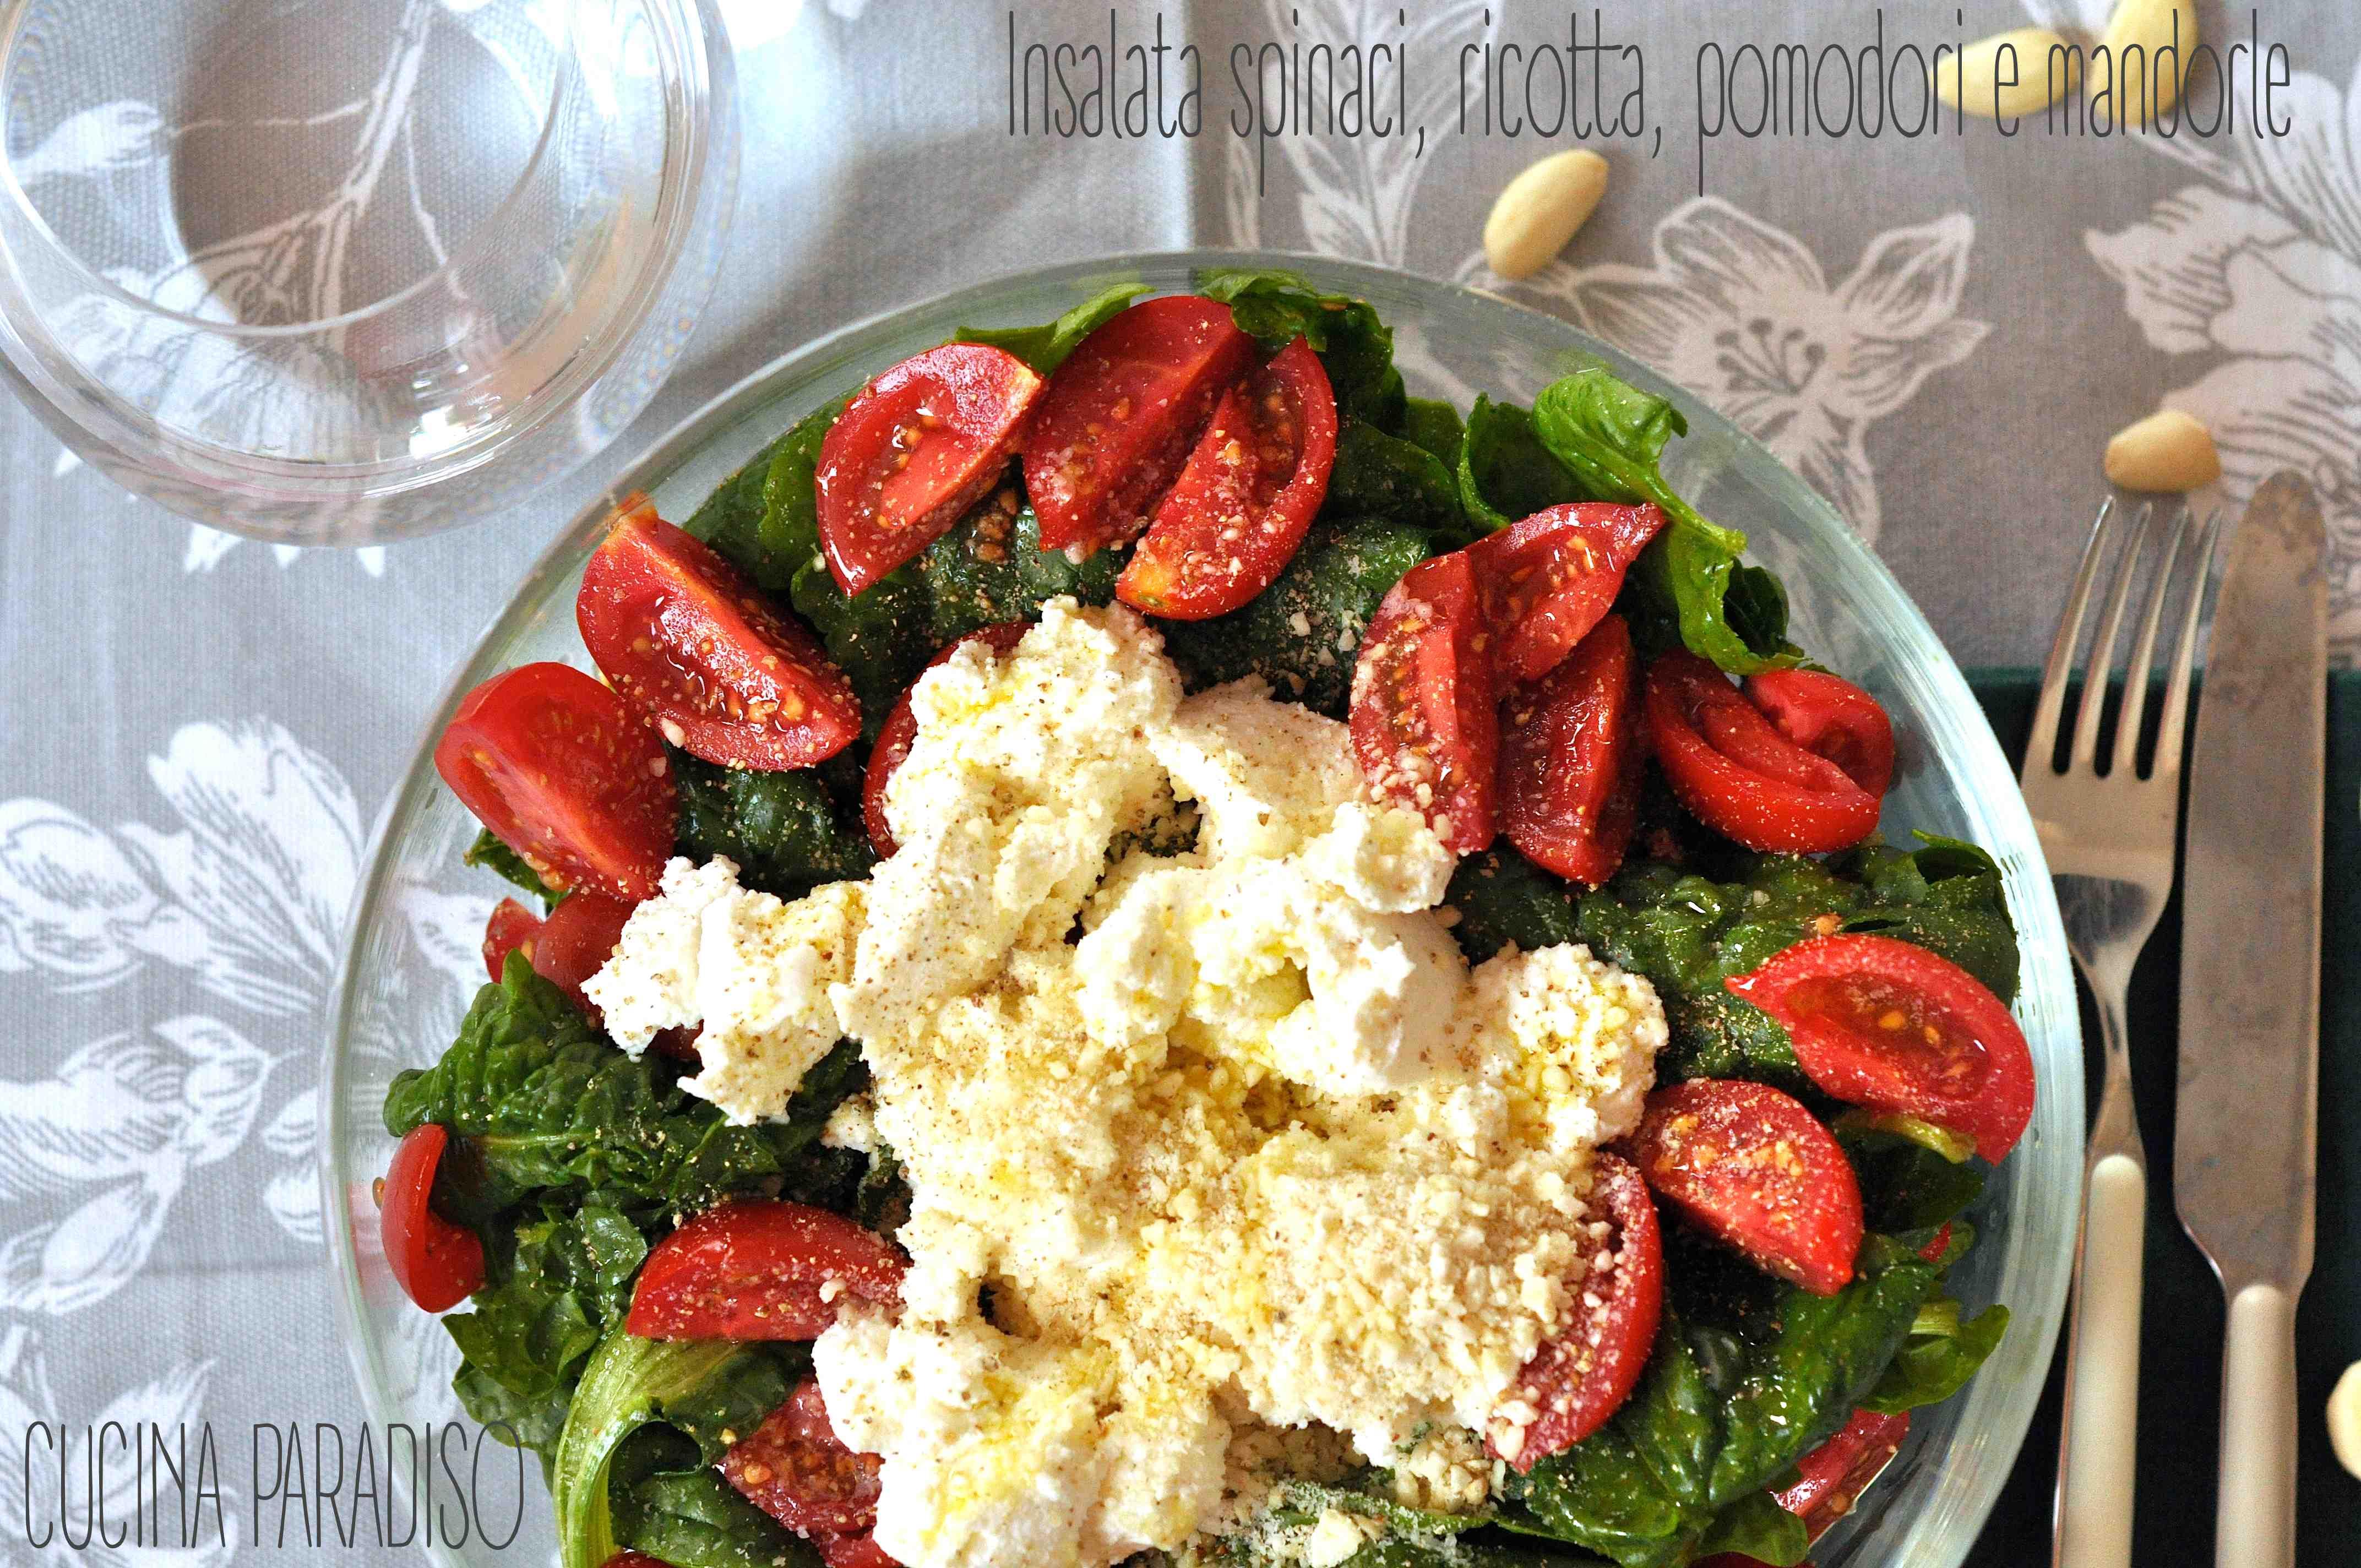 Insalata spinaci, ricotta, pomodori e mandorle2